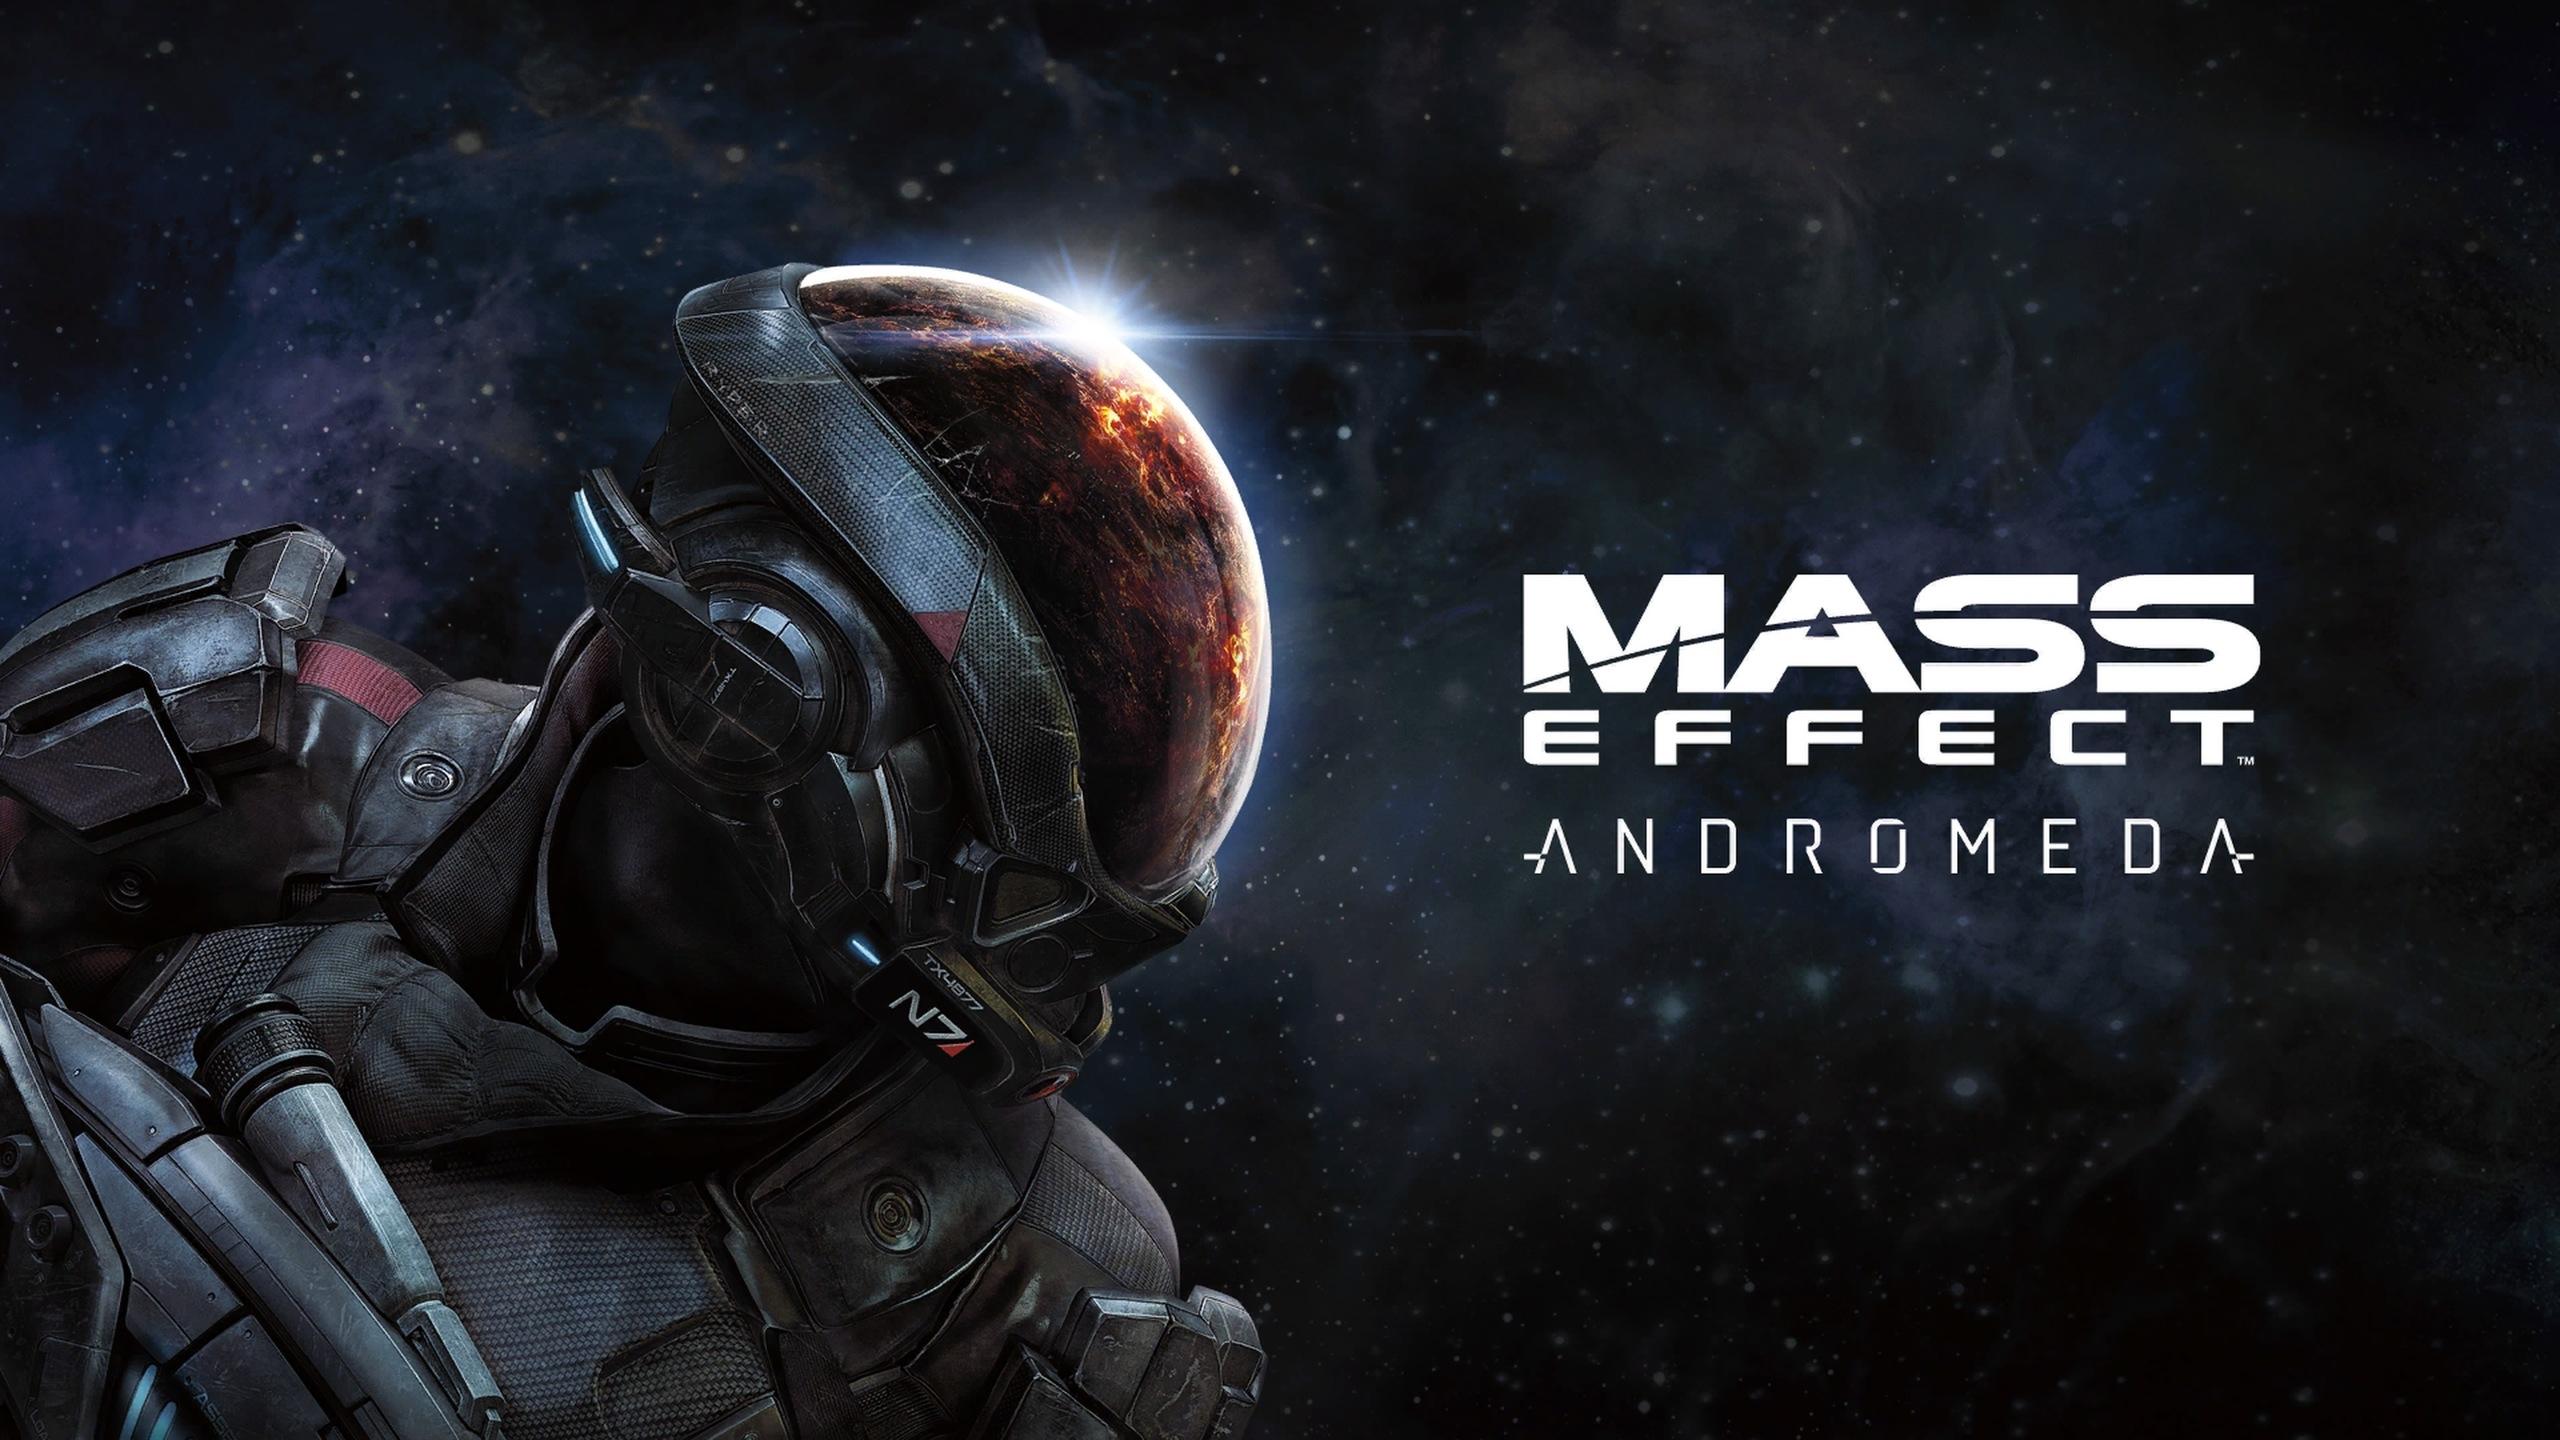 2560x1440 Mass Effect Andromeda 4k 1440p Resolution Hd 4k